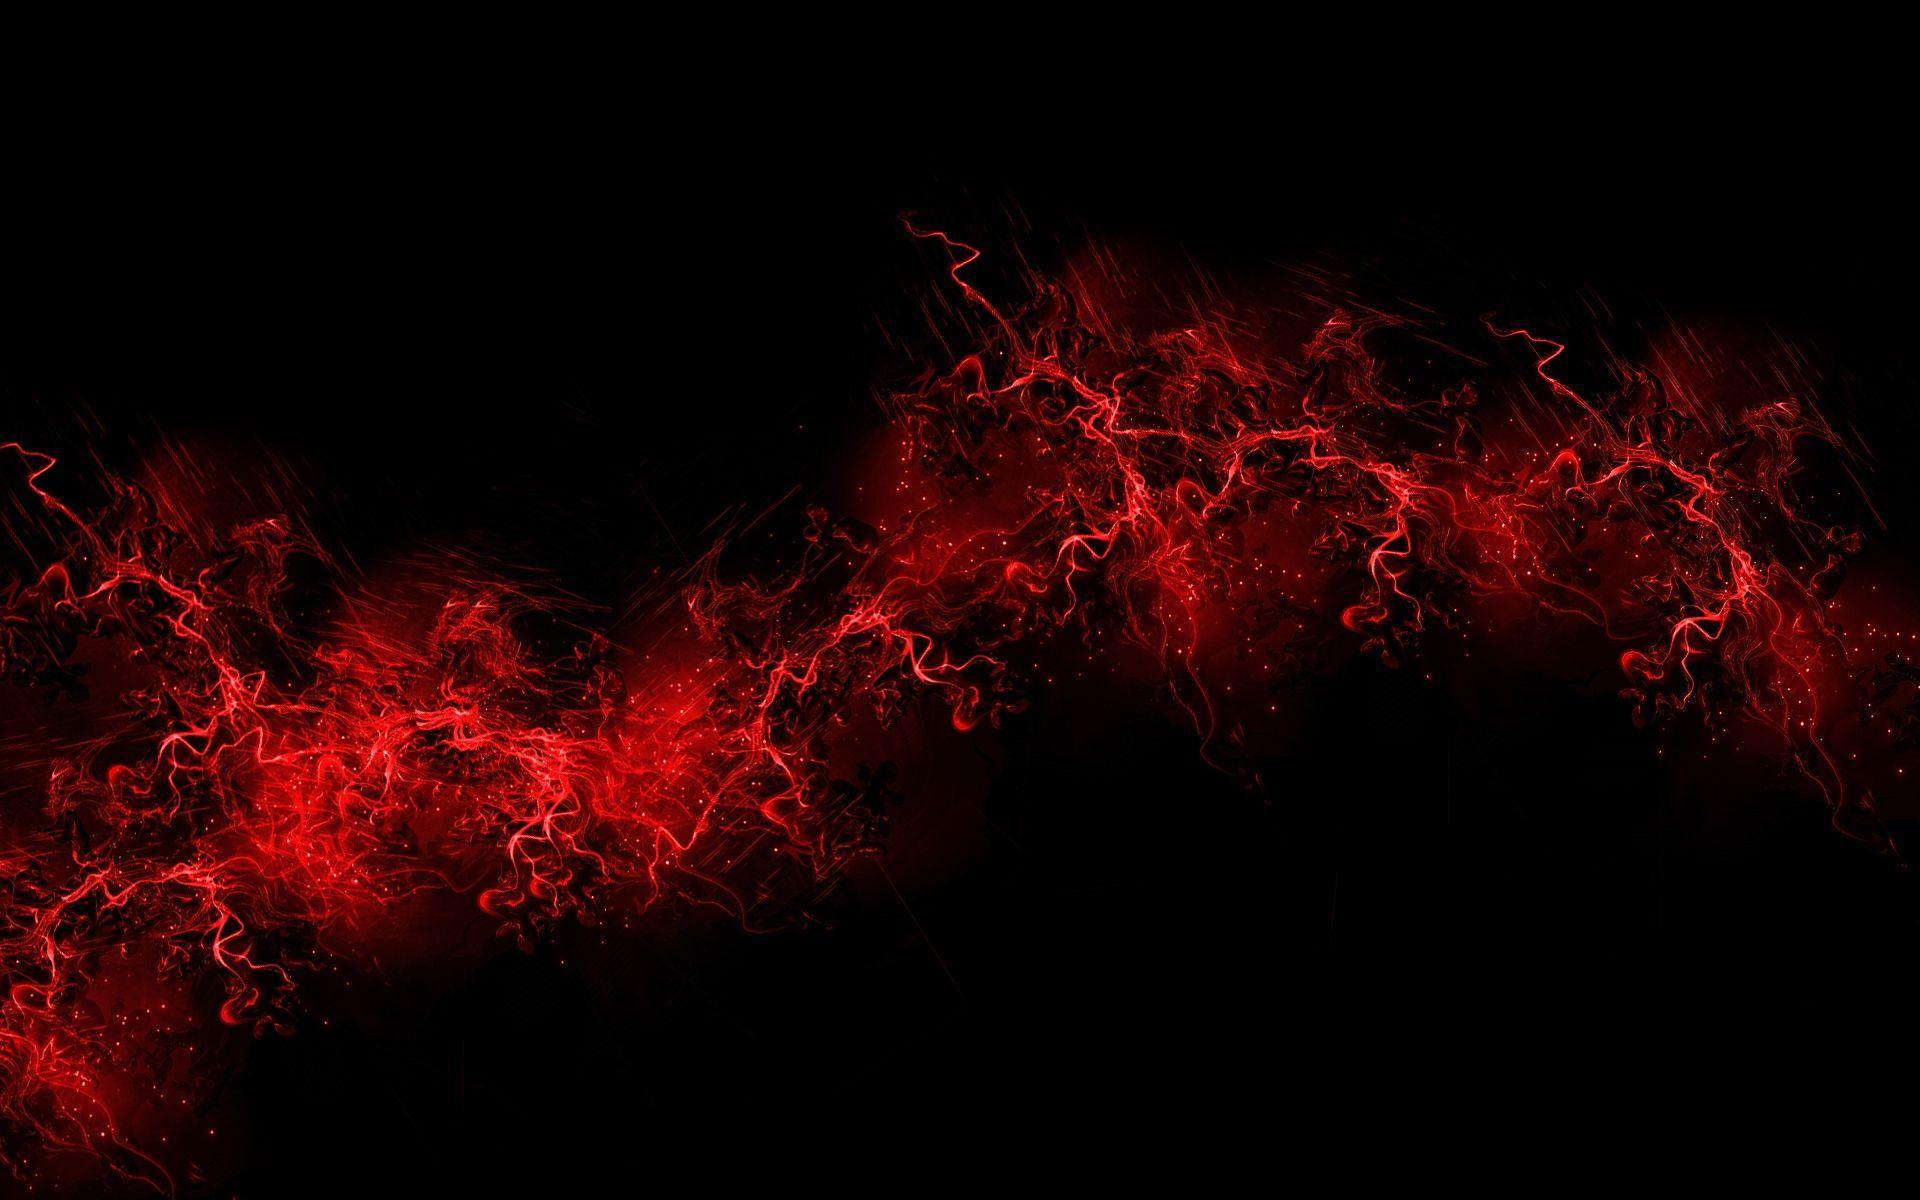 Red Desktop Wallpapers Top Free Red Desktop Backgrounds Wallpaperaccess